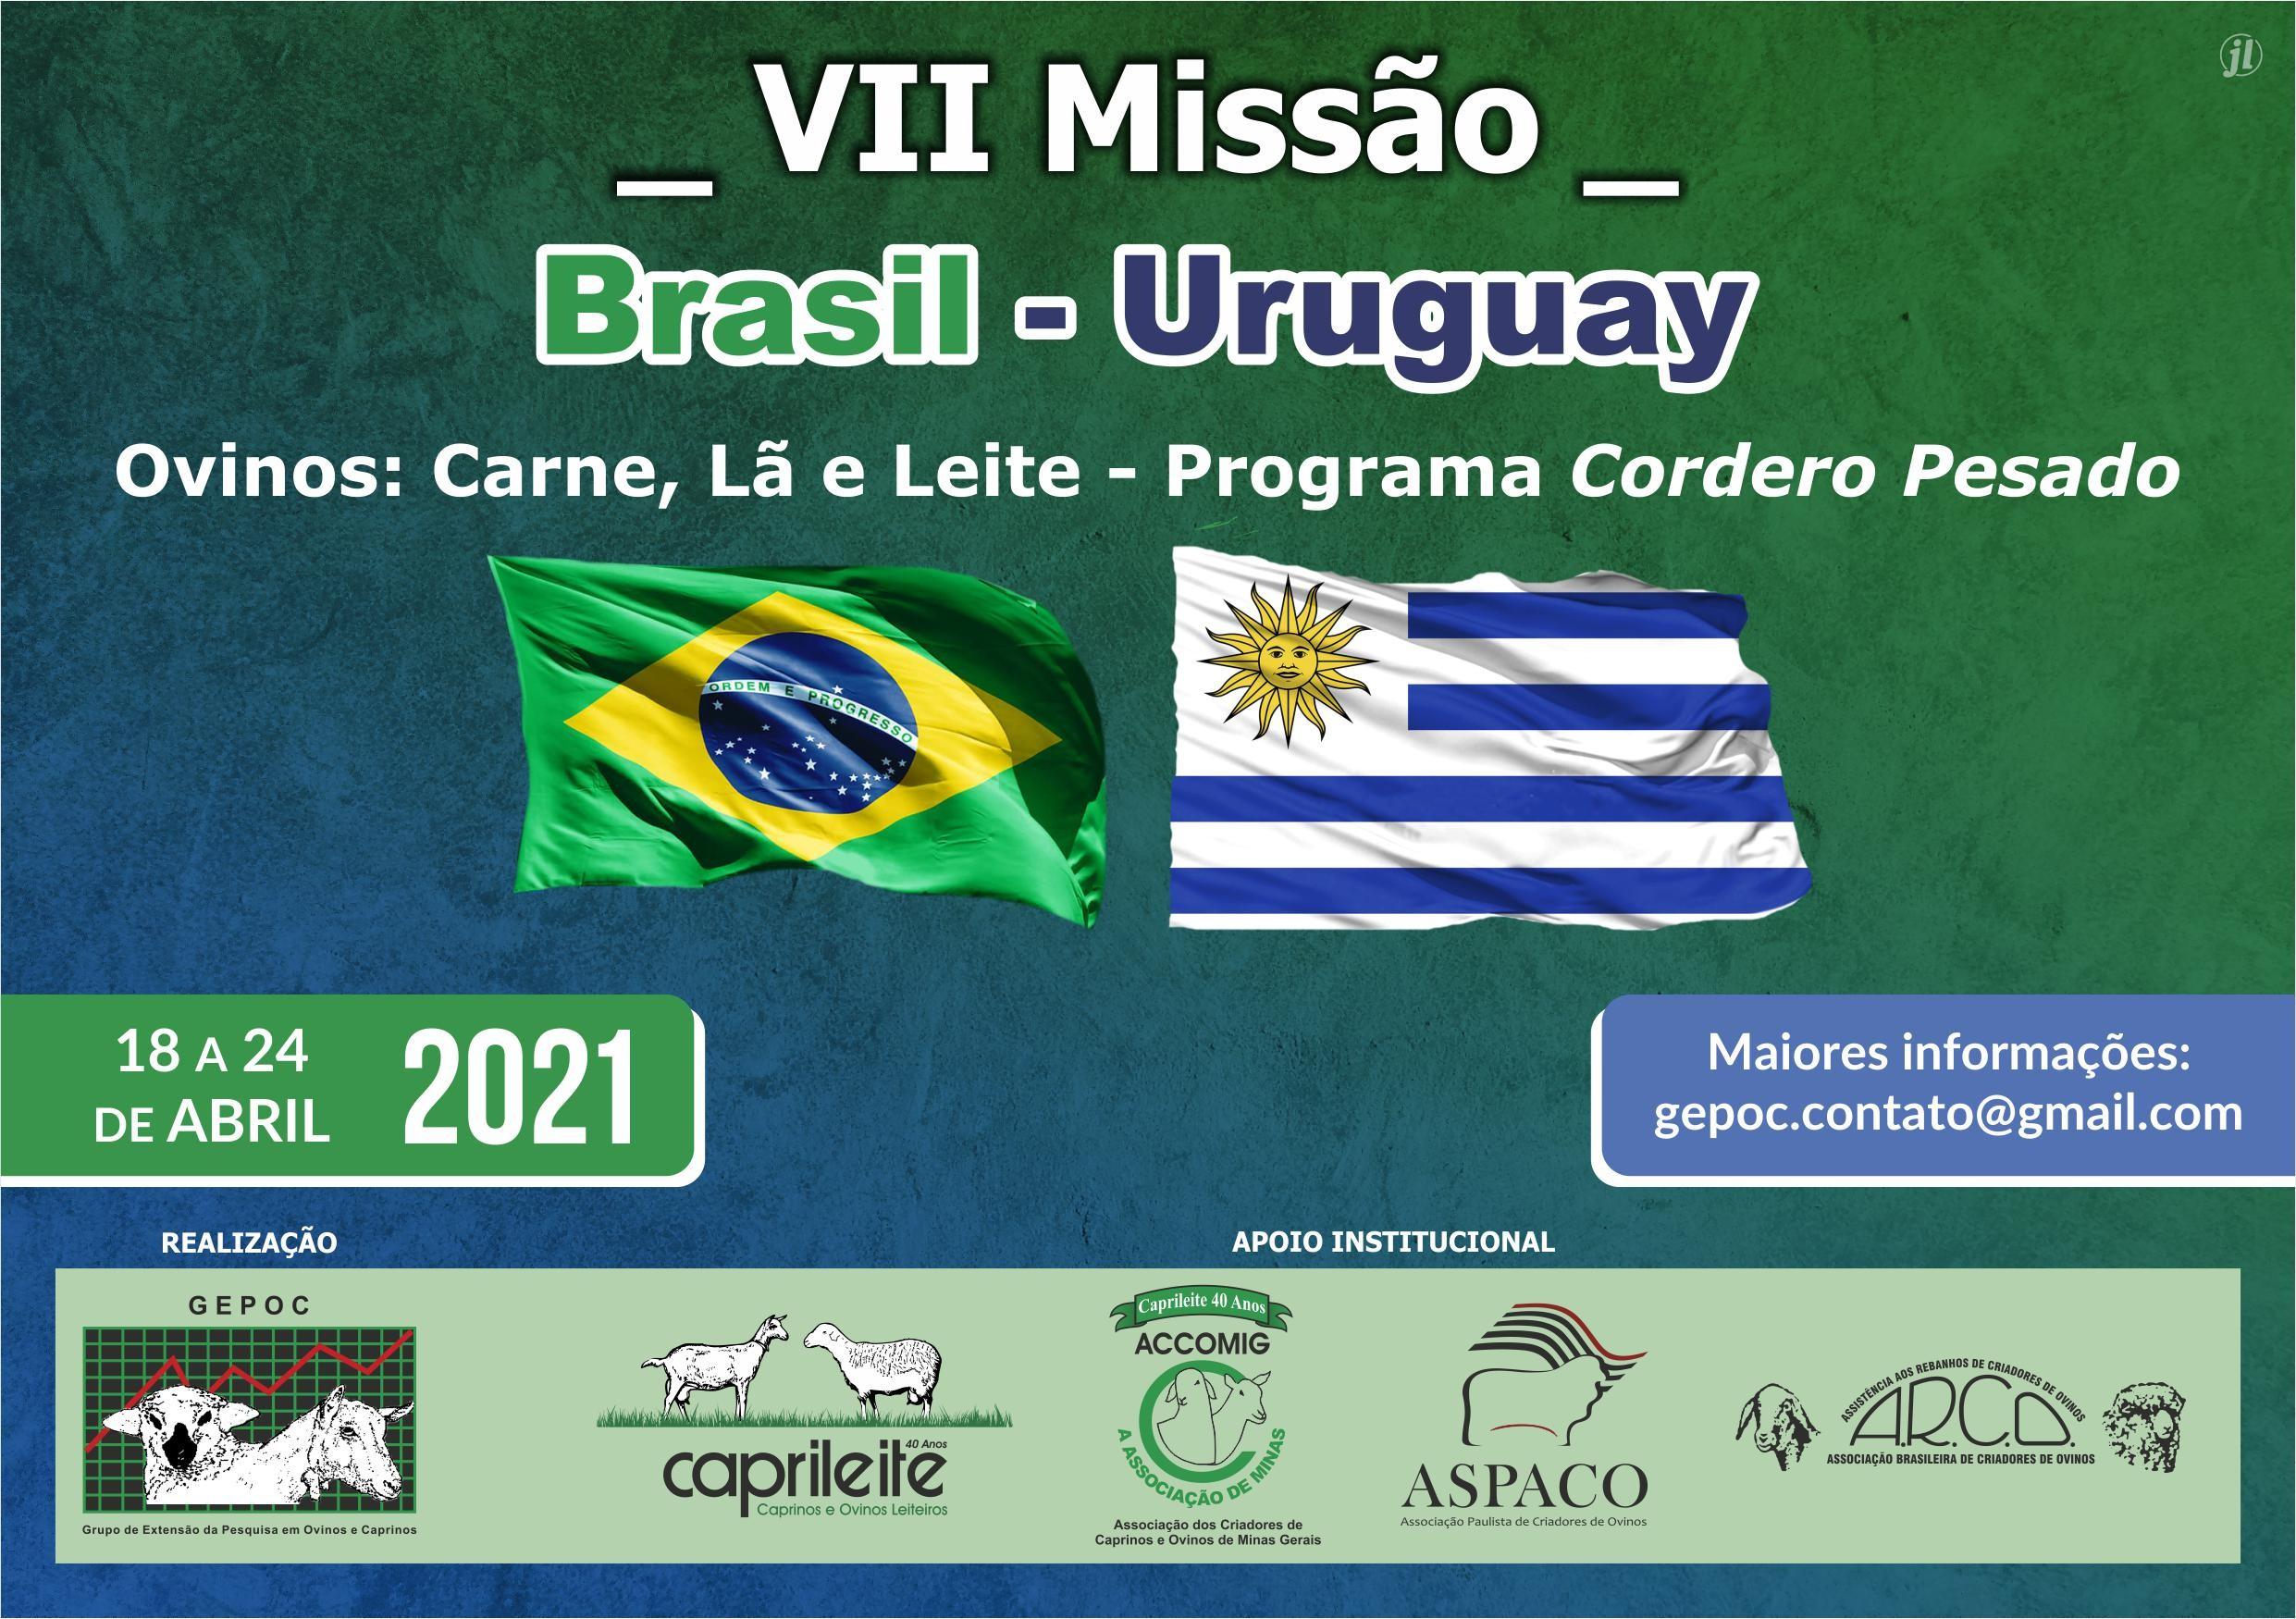 VII MISSÃO BRASIL URUGUAY 18 a 24/04/2021